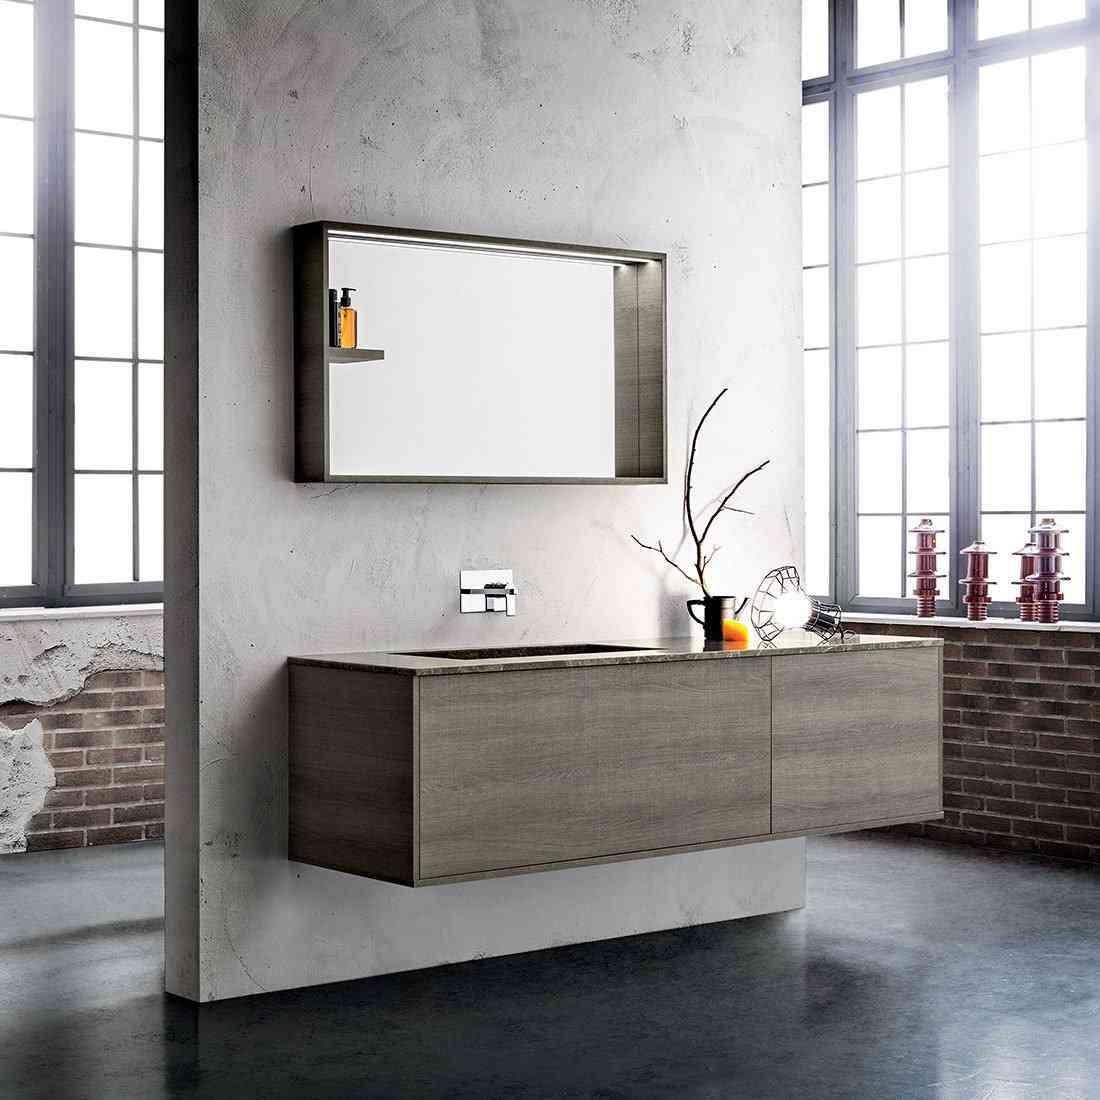 Bagni cerasa san gaetano arredamenti for Minimal home mobili